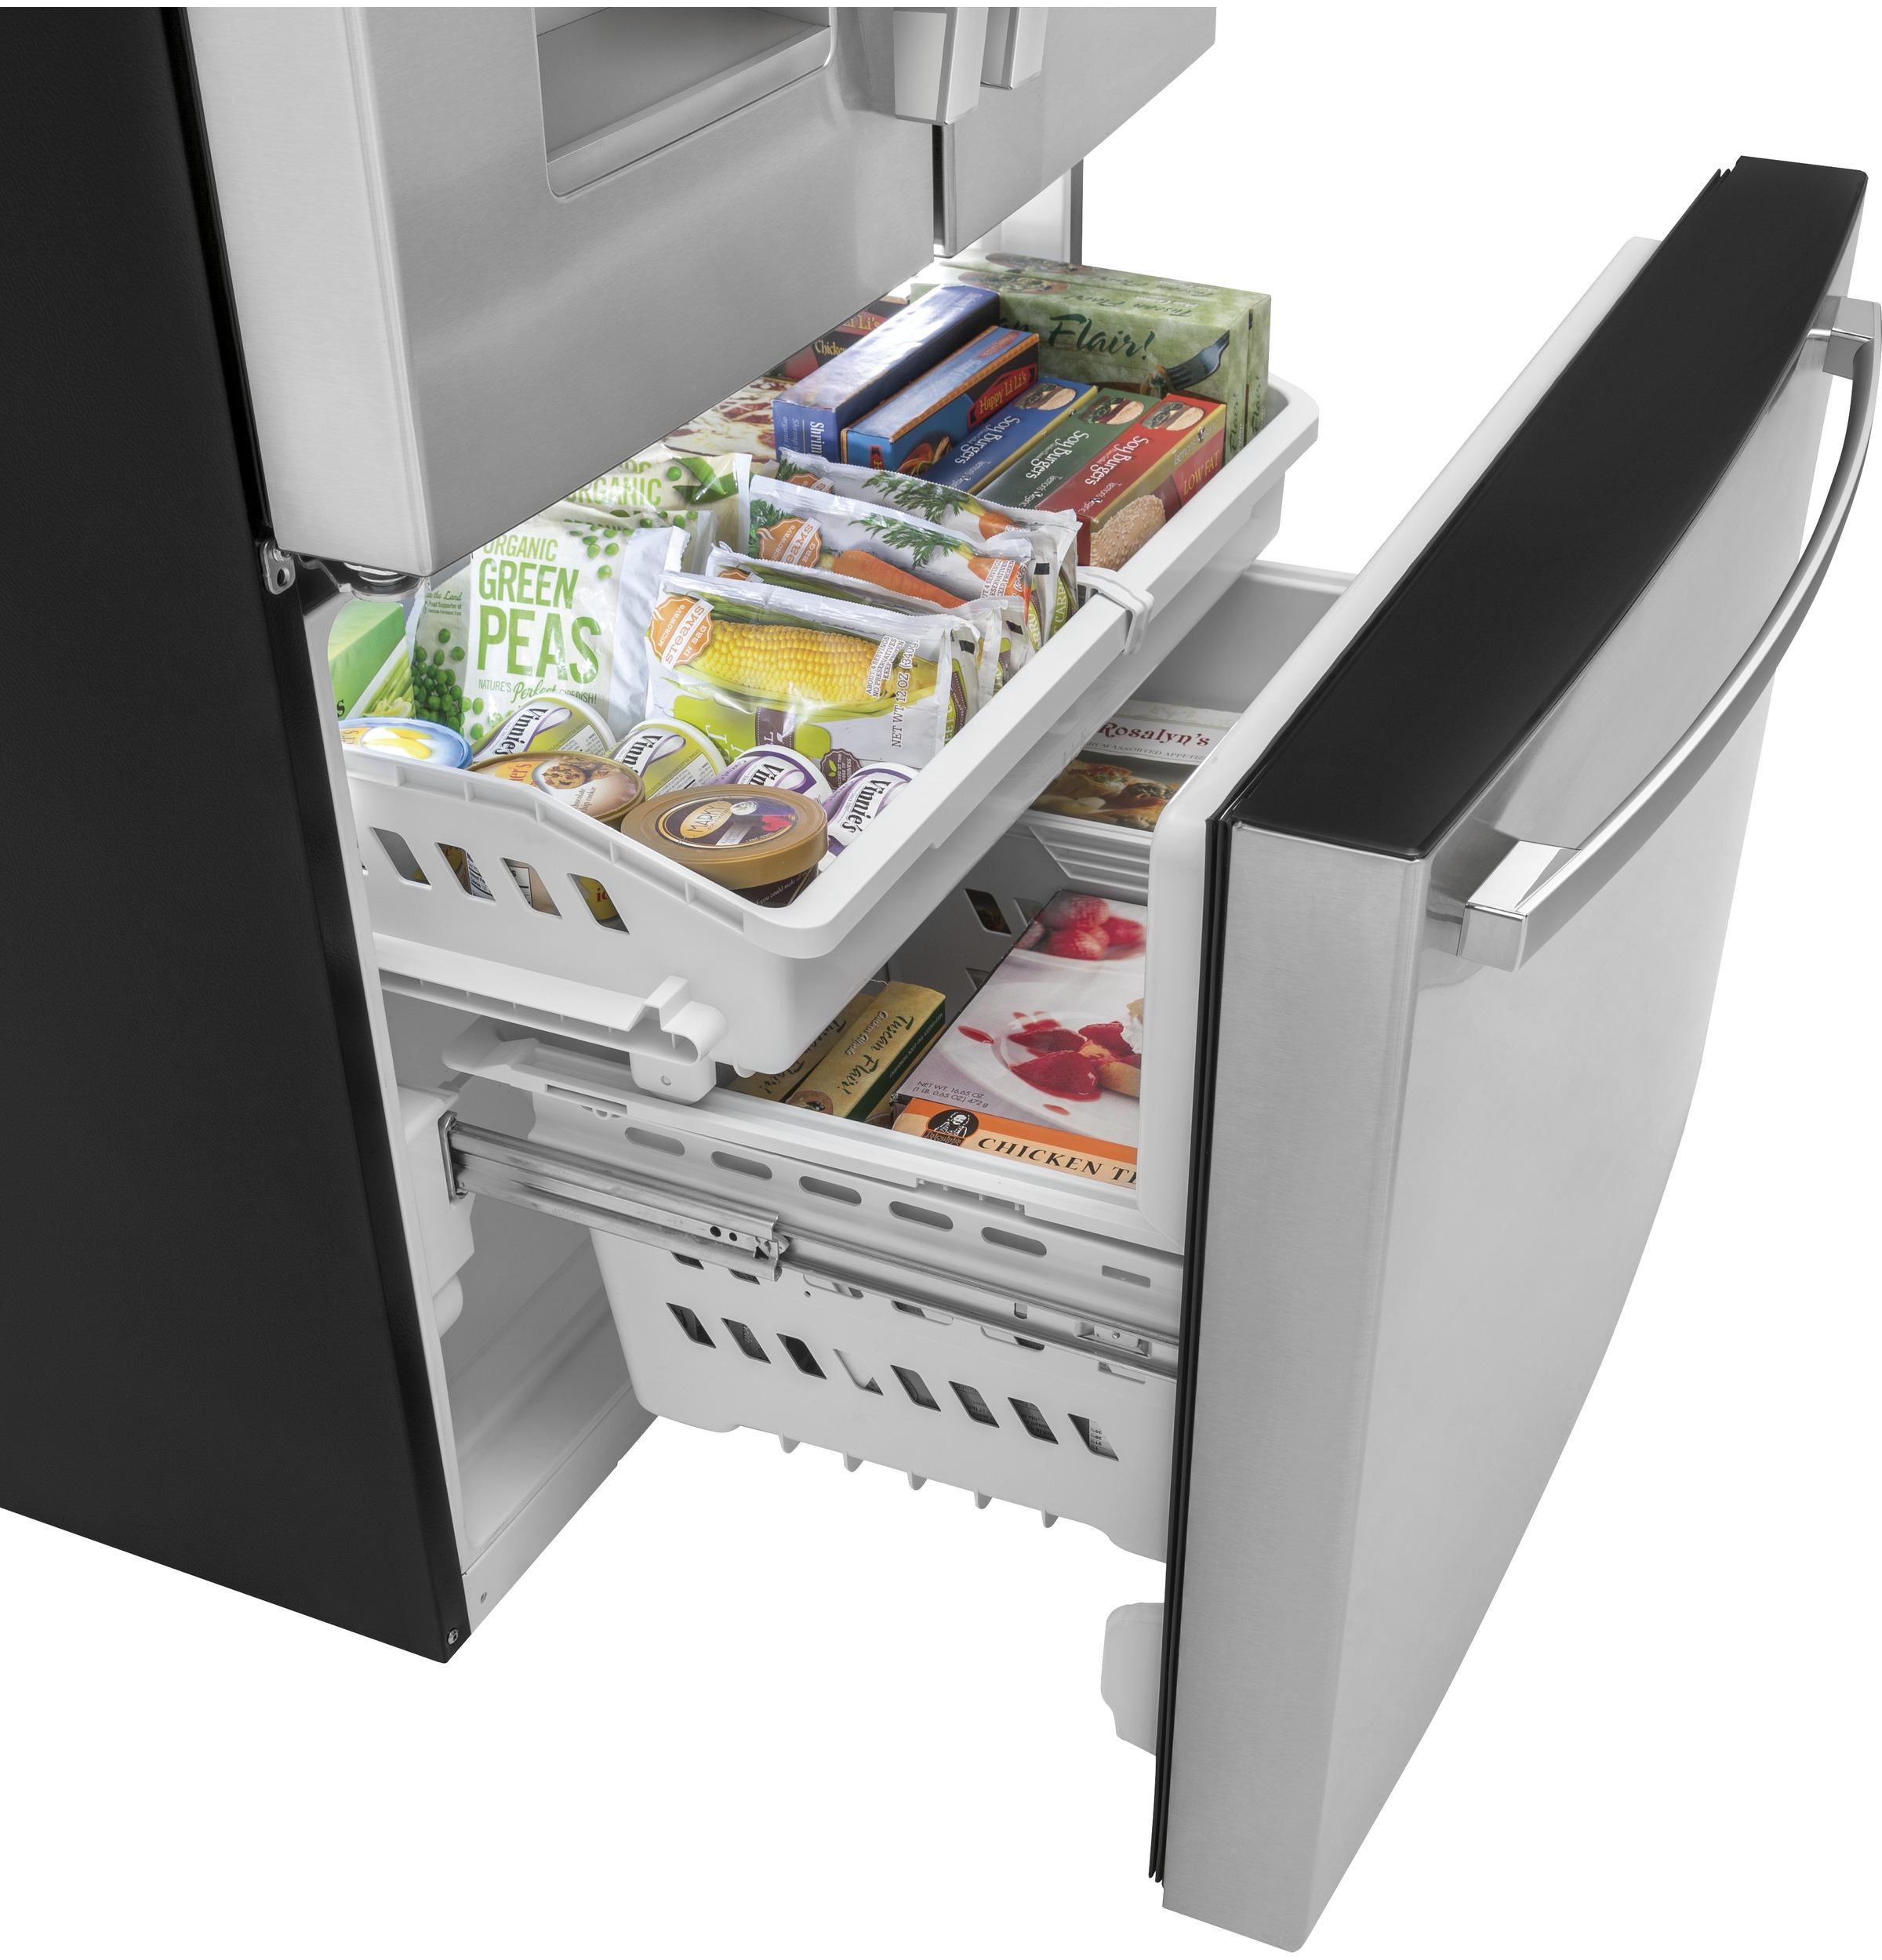 Model: GYE18JSLSS | GE GE® ENERGY STAR® 17.5 Cu. Ft. Counter-Depth French-Door Refrigerator